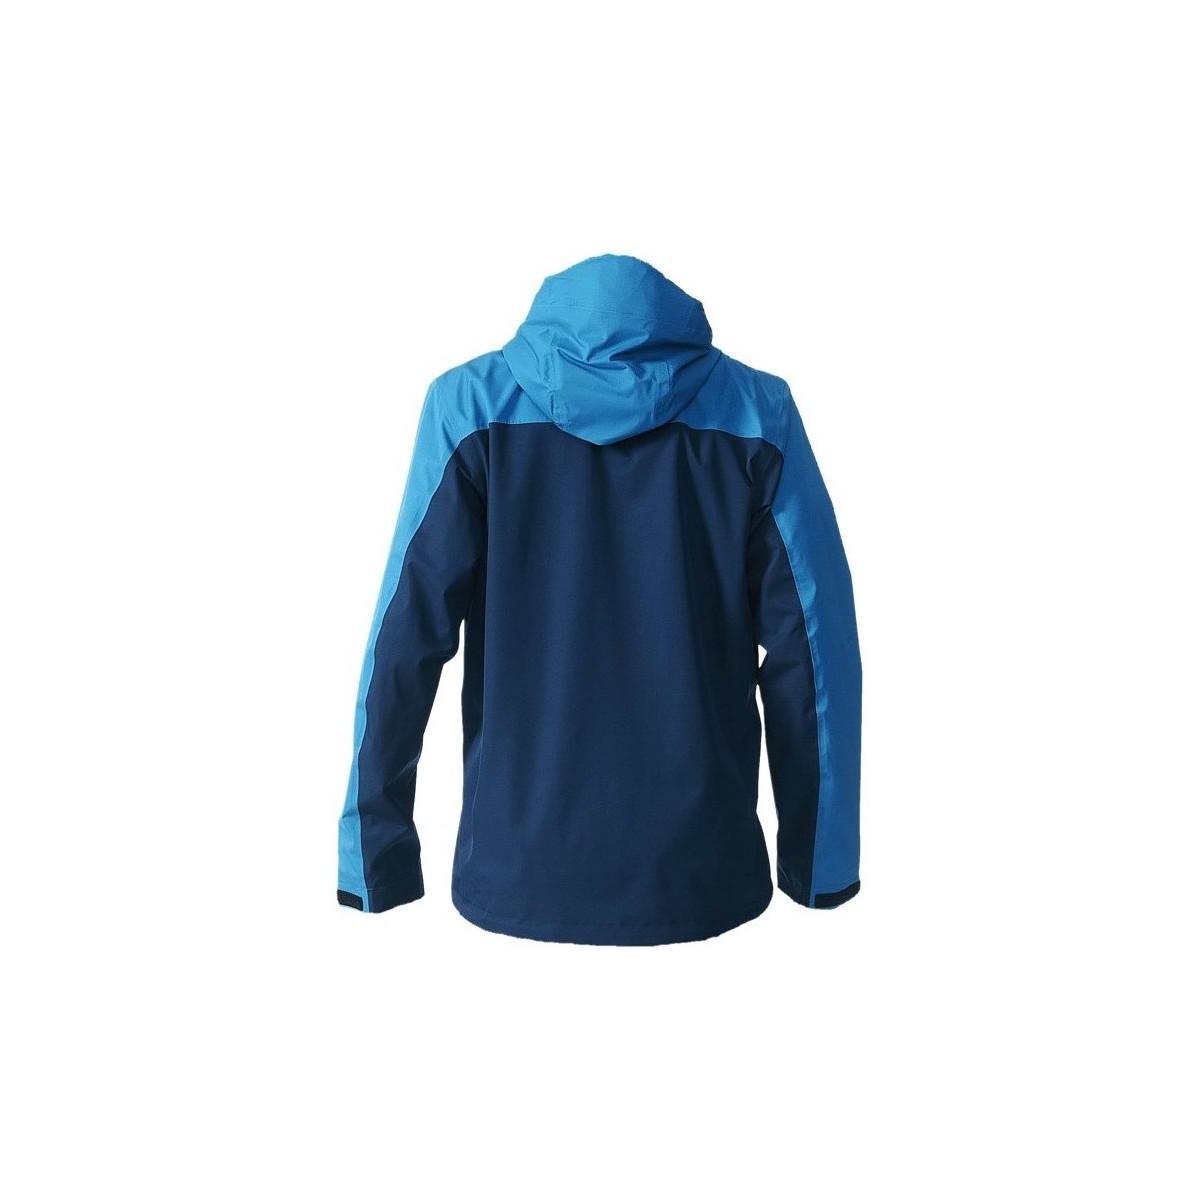 adidas Wandertag Jacket Men's Jacket In Blue for Men